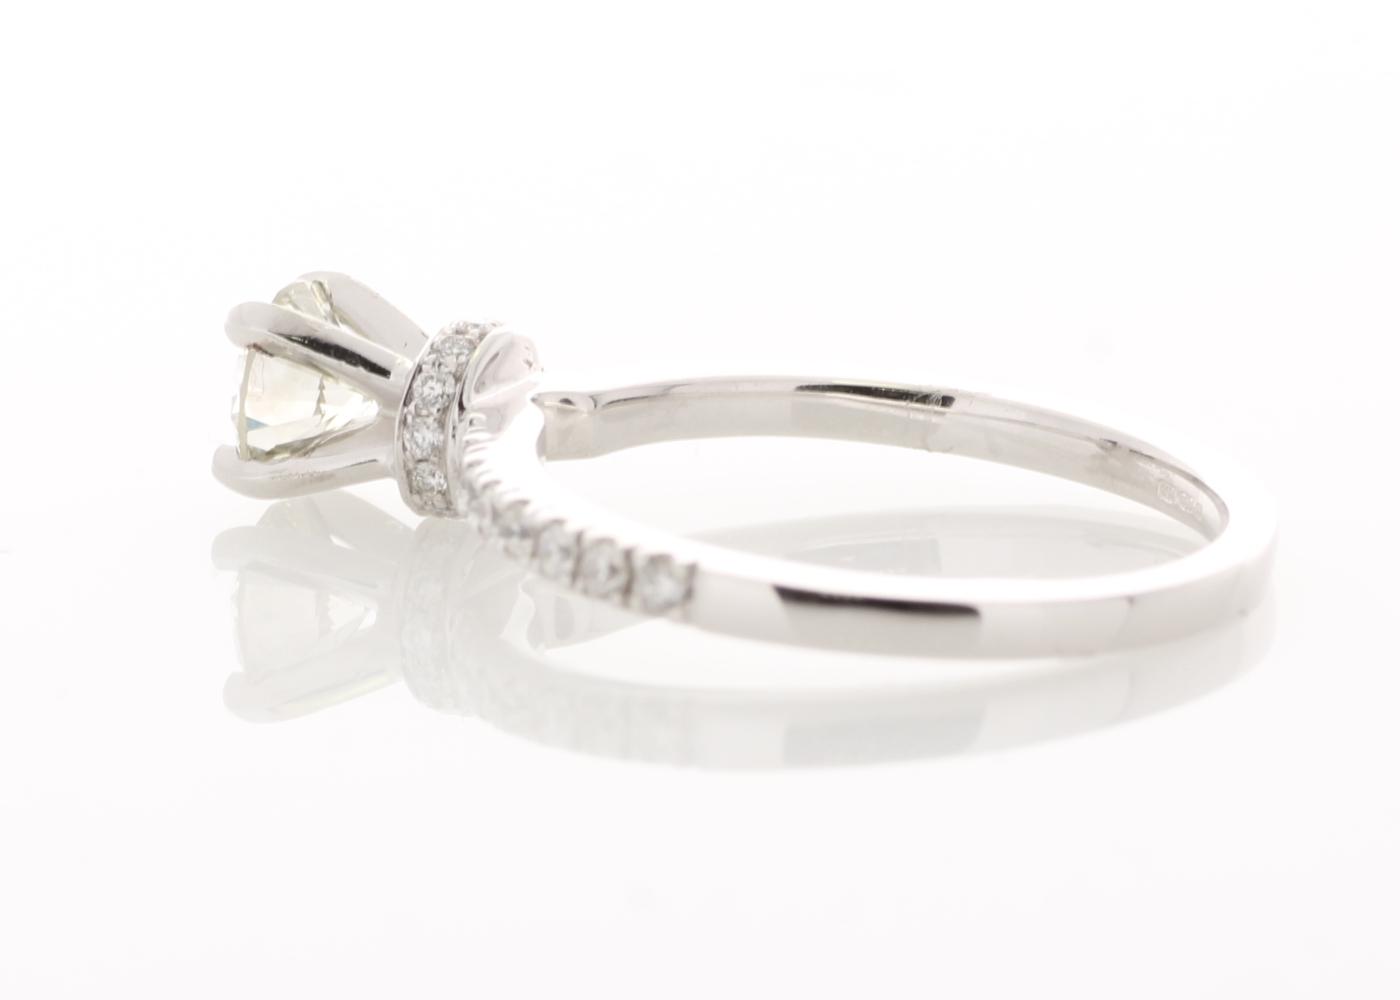 Lot 20 - 18ct White Gold Diamond Ring 0.73 Carats